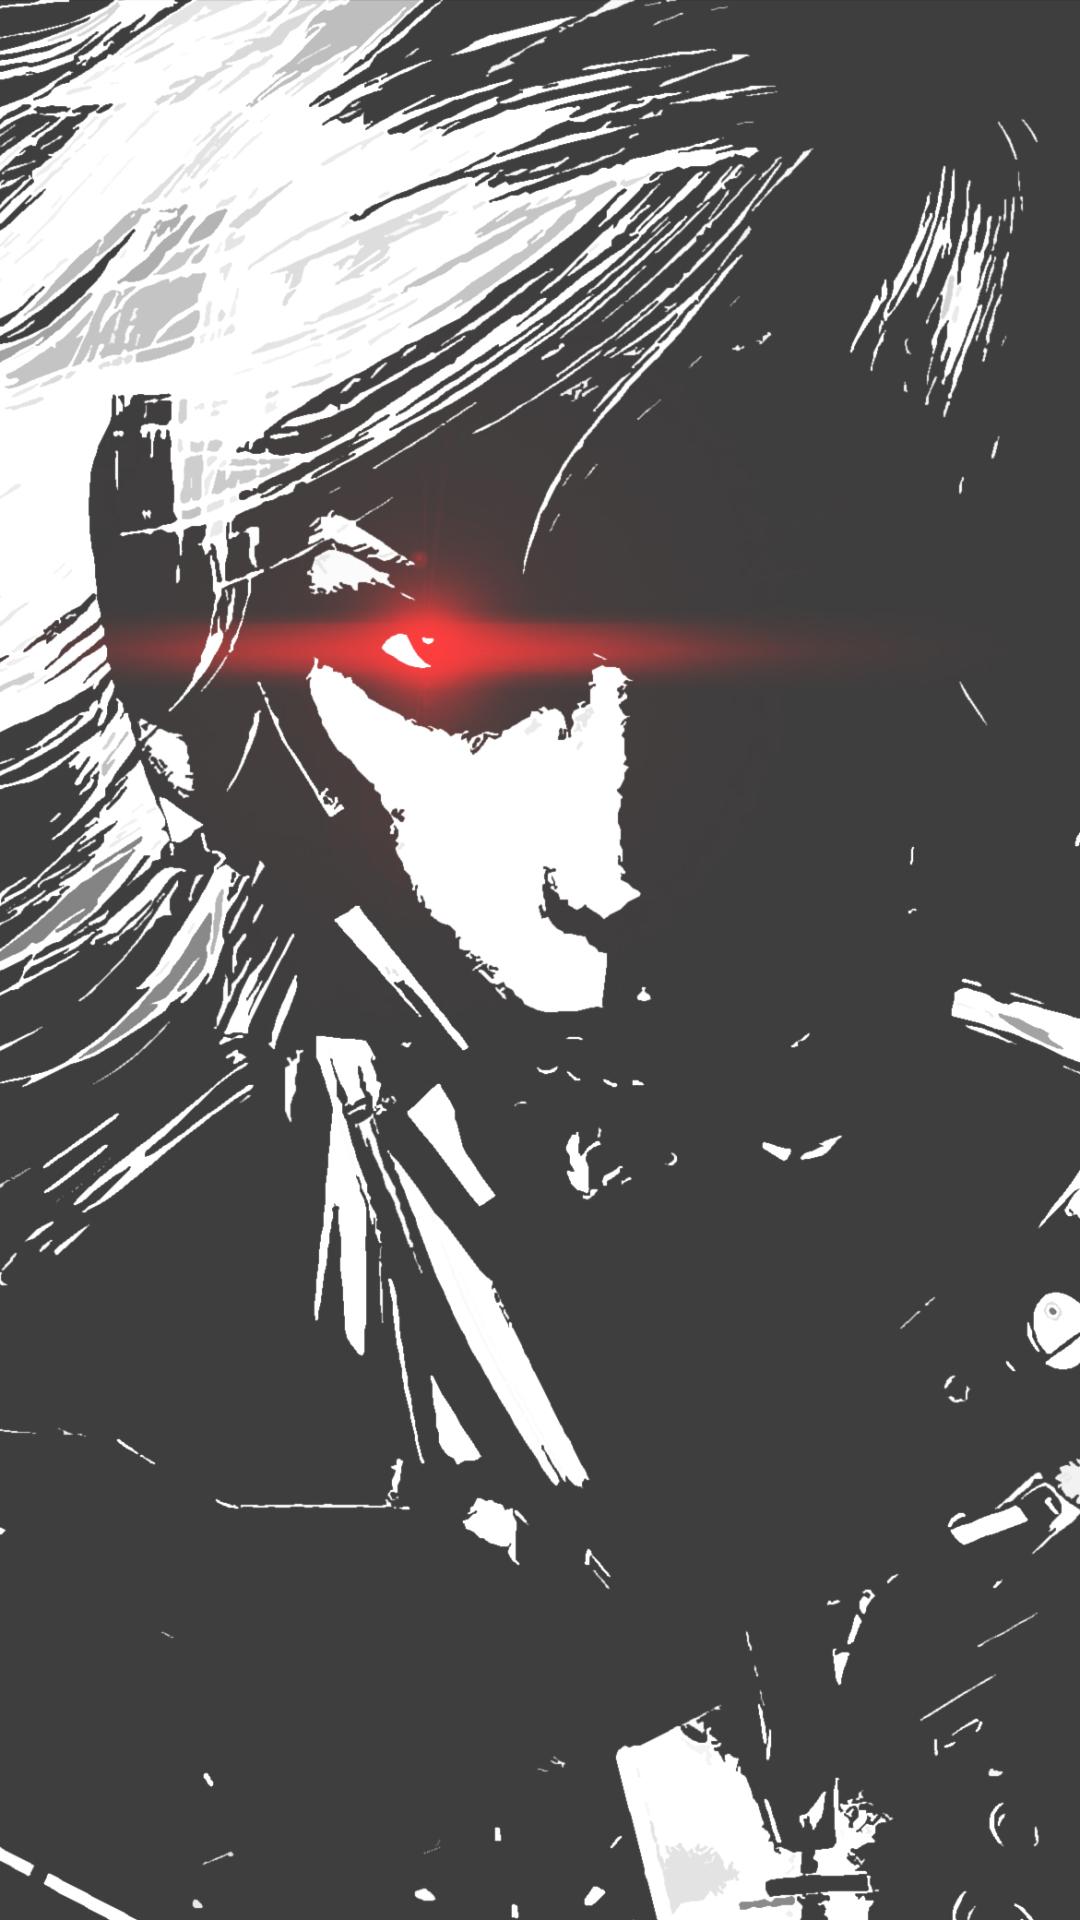 video game/metal gear rising (1080x1920) wallpaper id: 678414